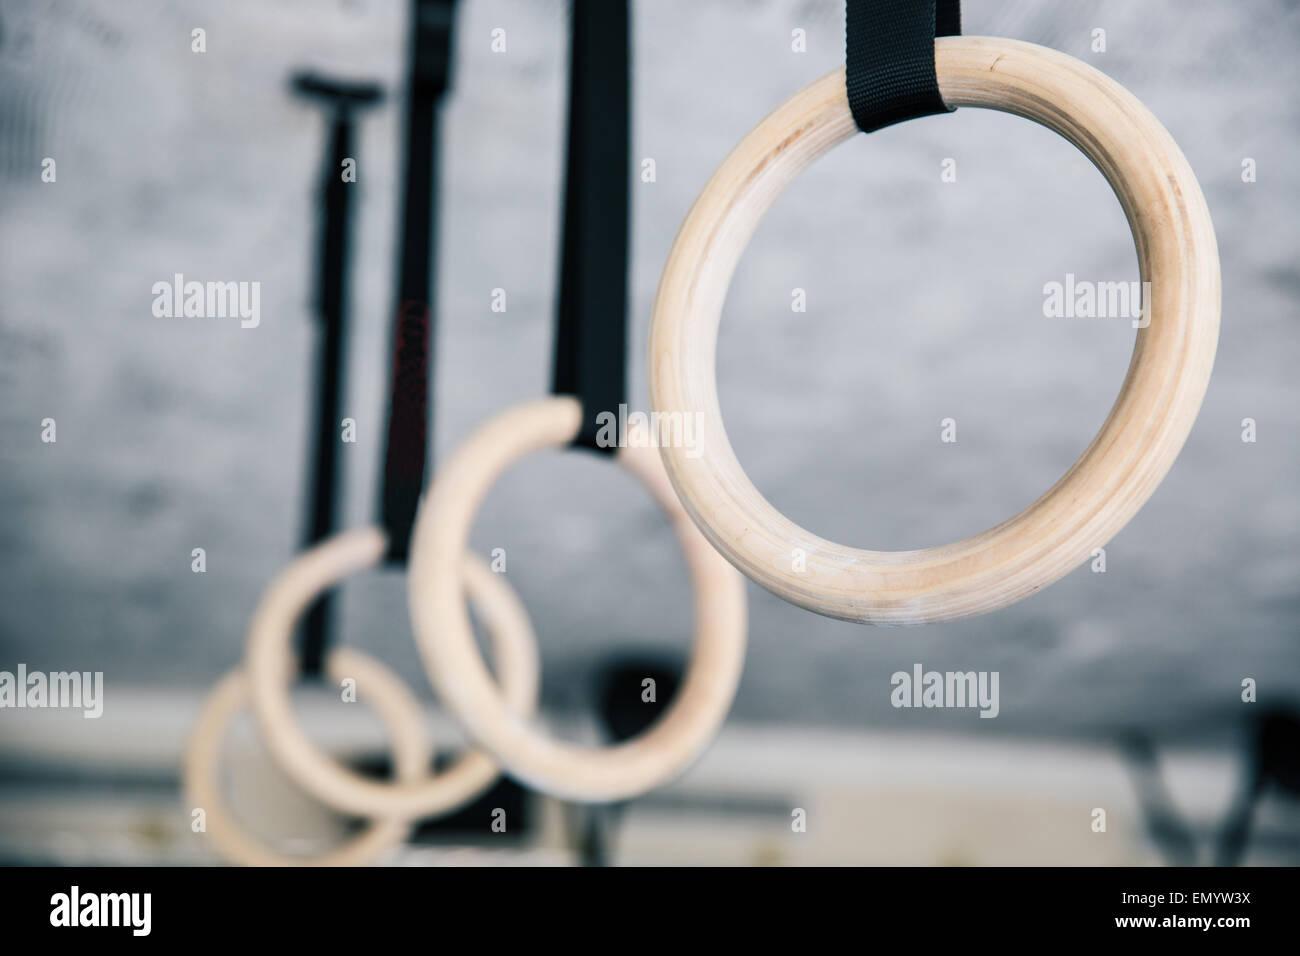 Nahaufnahme Bild von einem Fitness Ringe im Fitness-Studio Stockbild